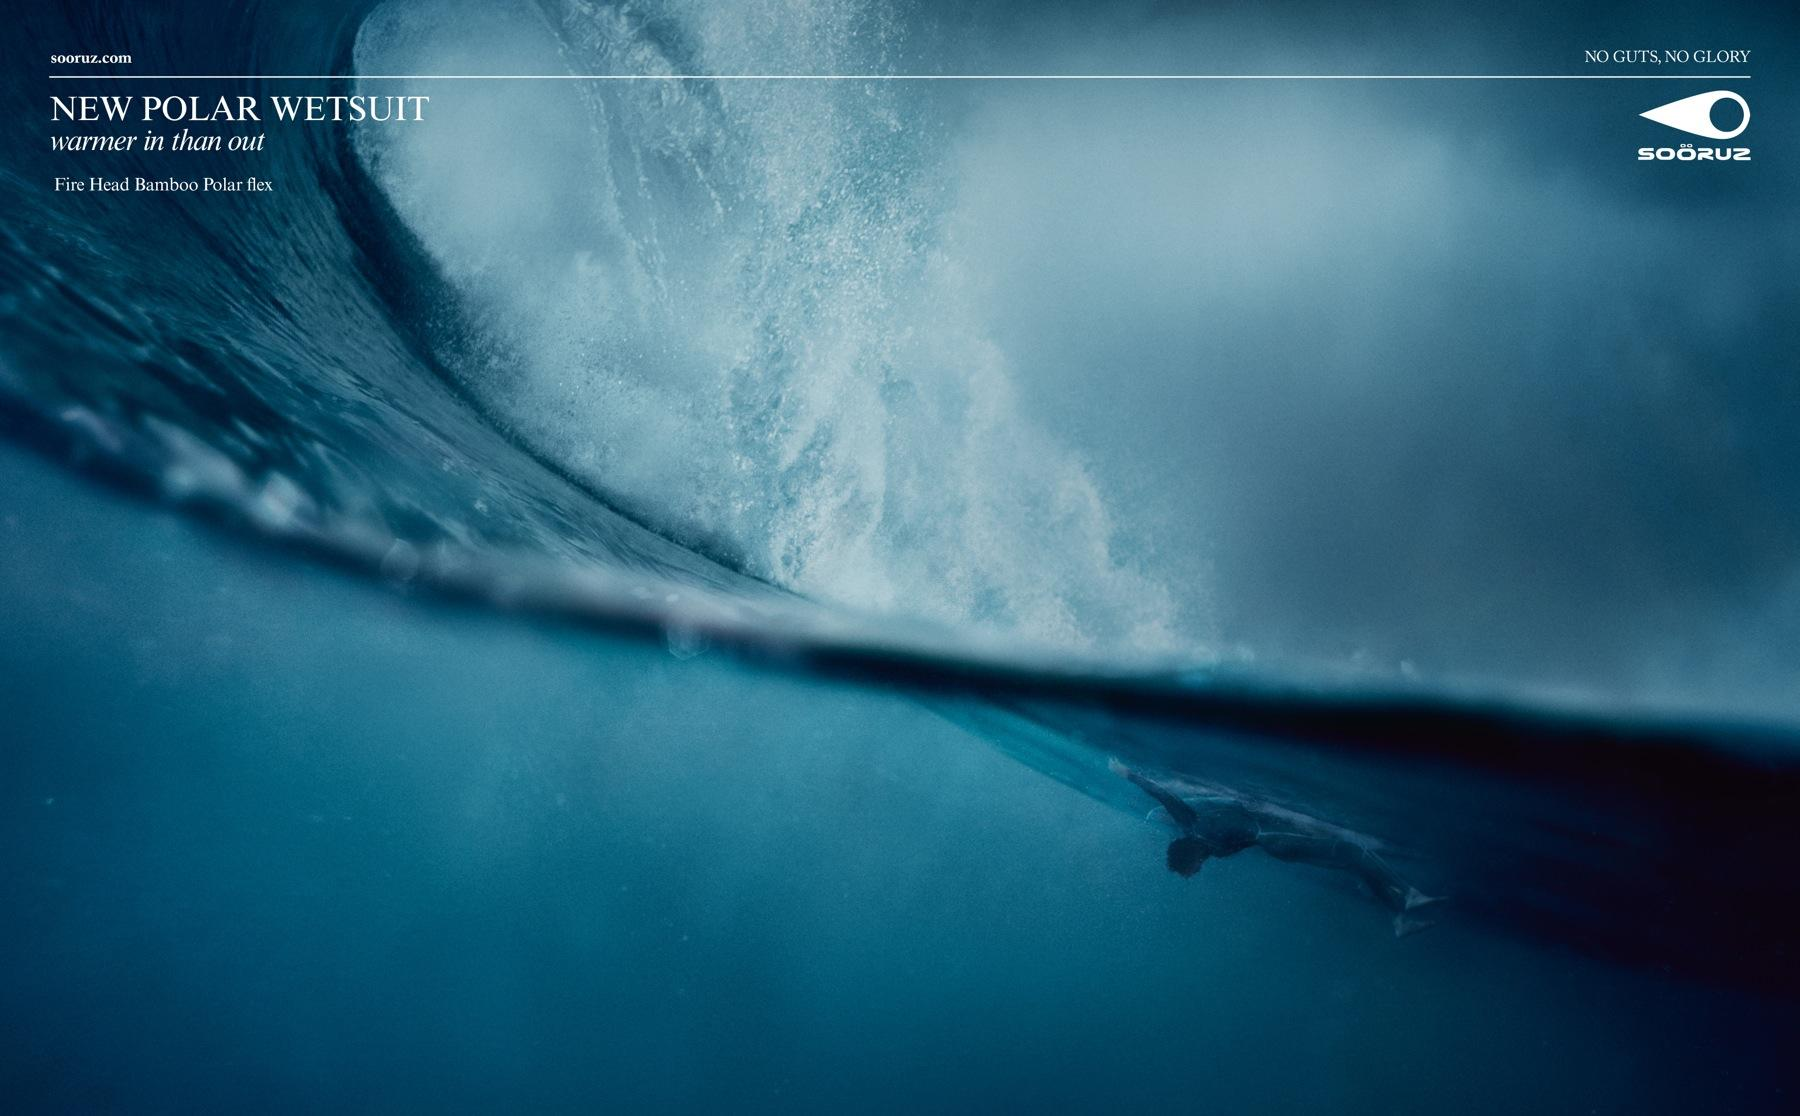 Sooruz Print Ad -  Polar Wetsuit, 2